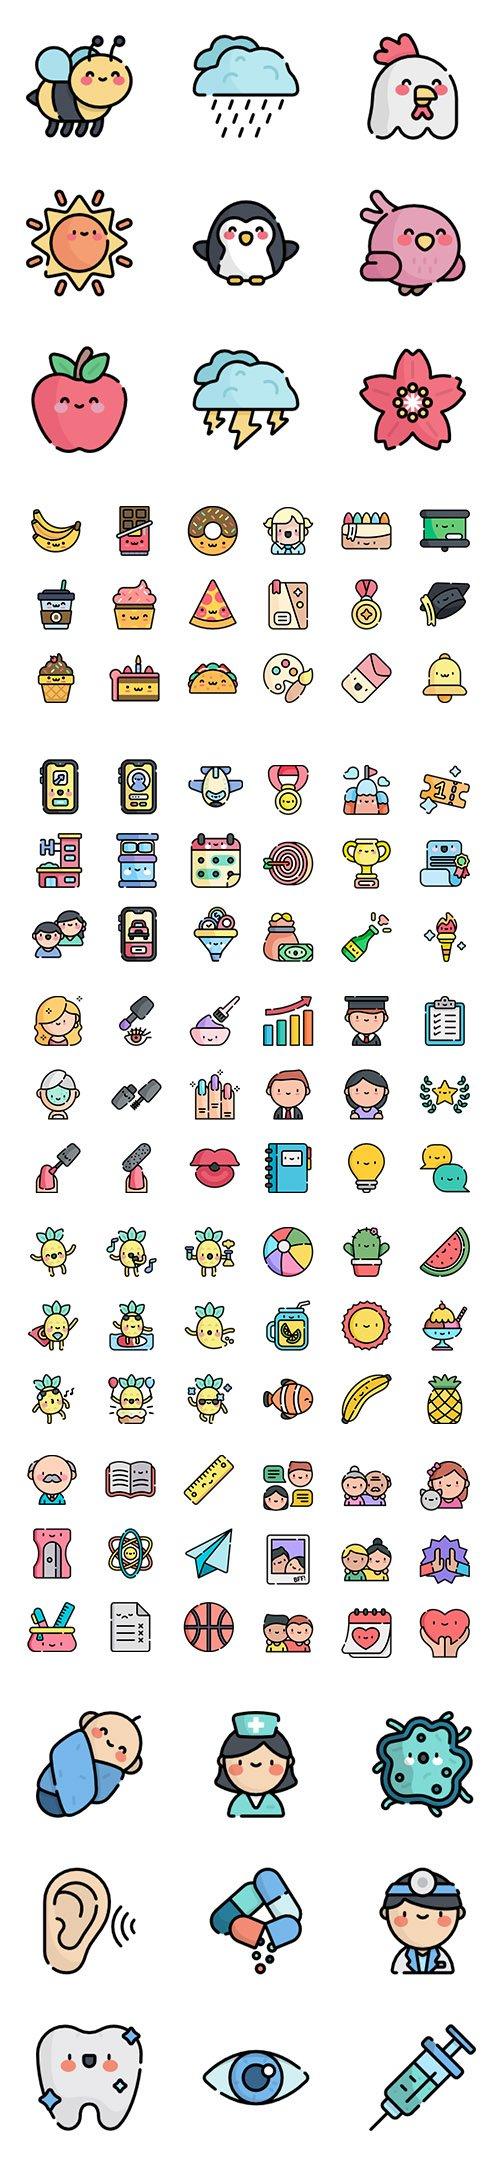 450+ Kawaii Lineal color Vector Icons Set vol2